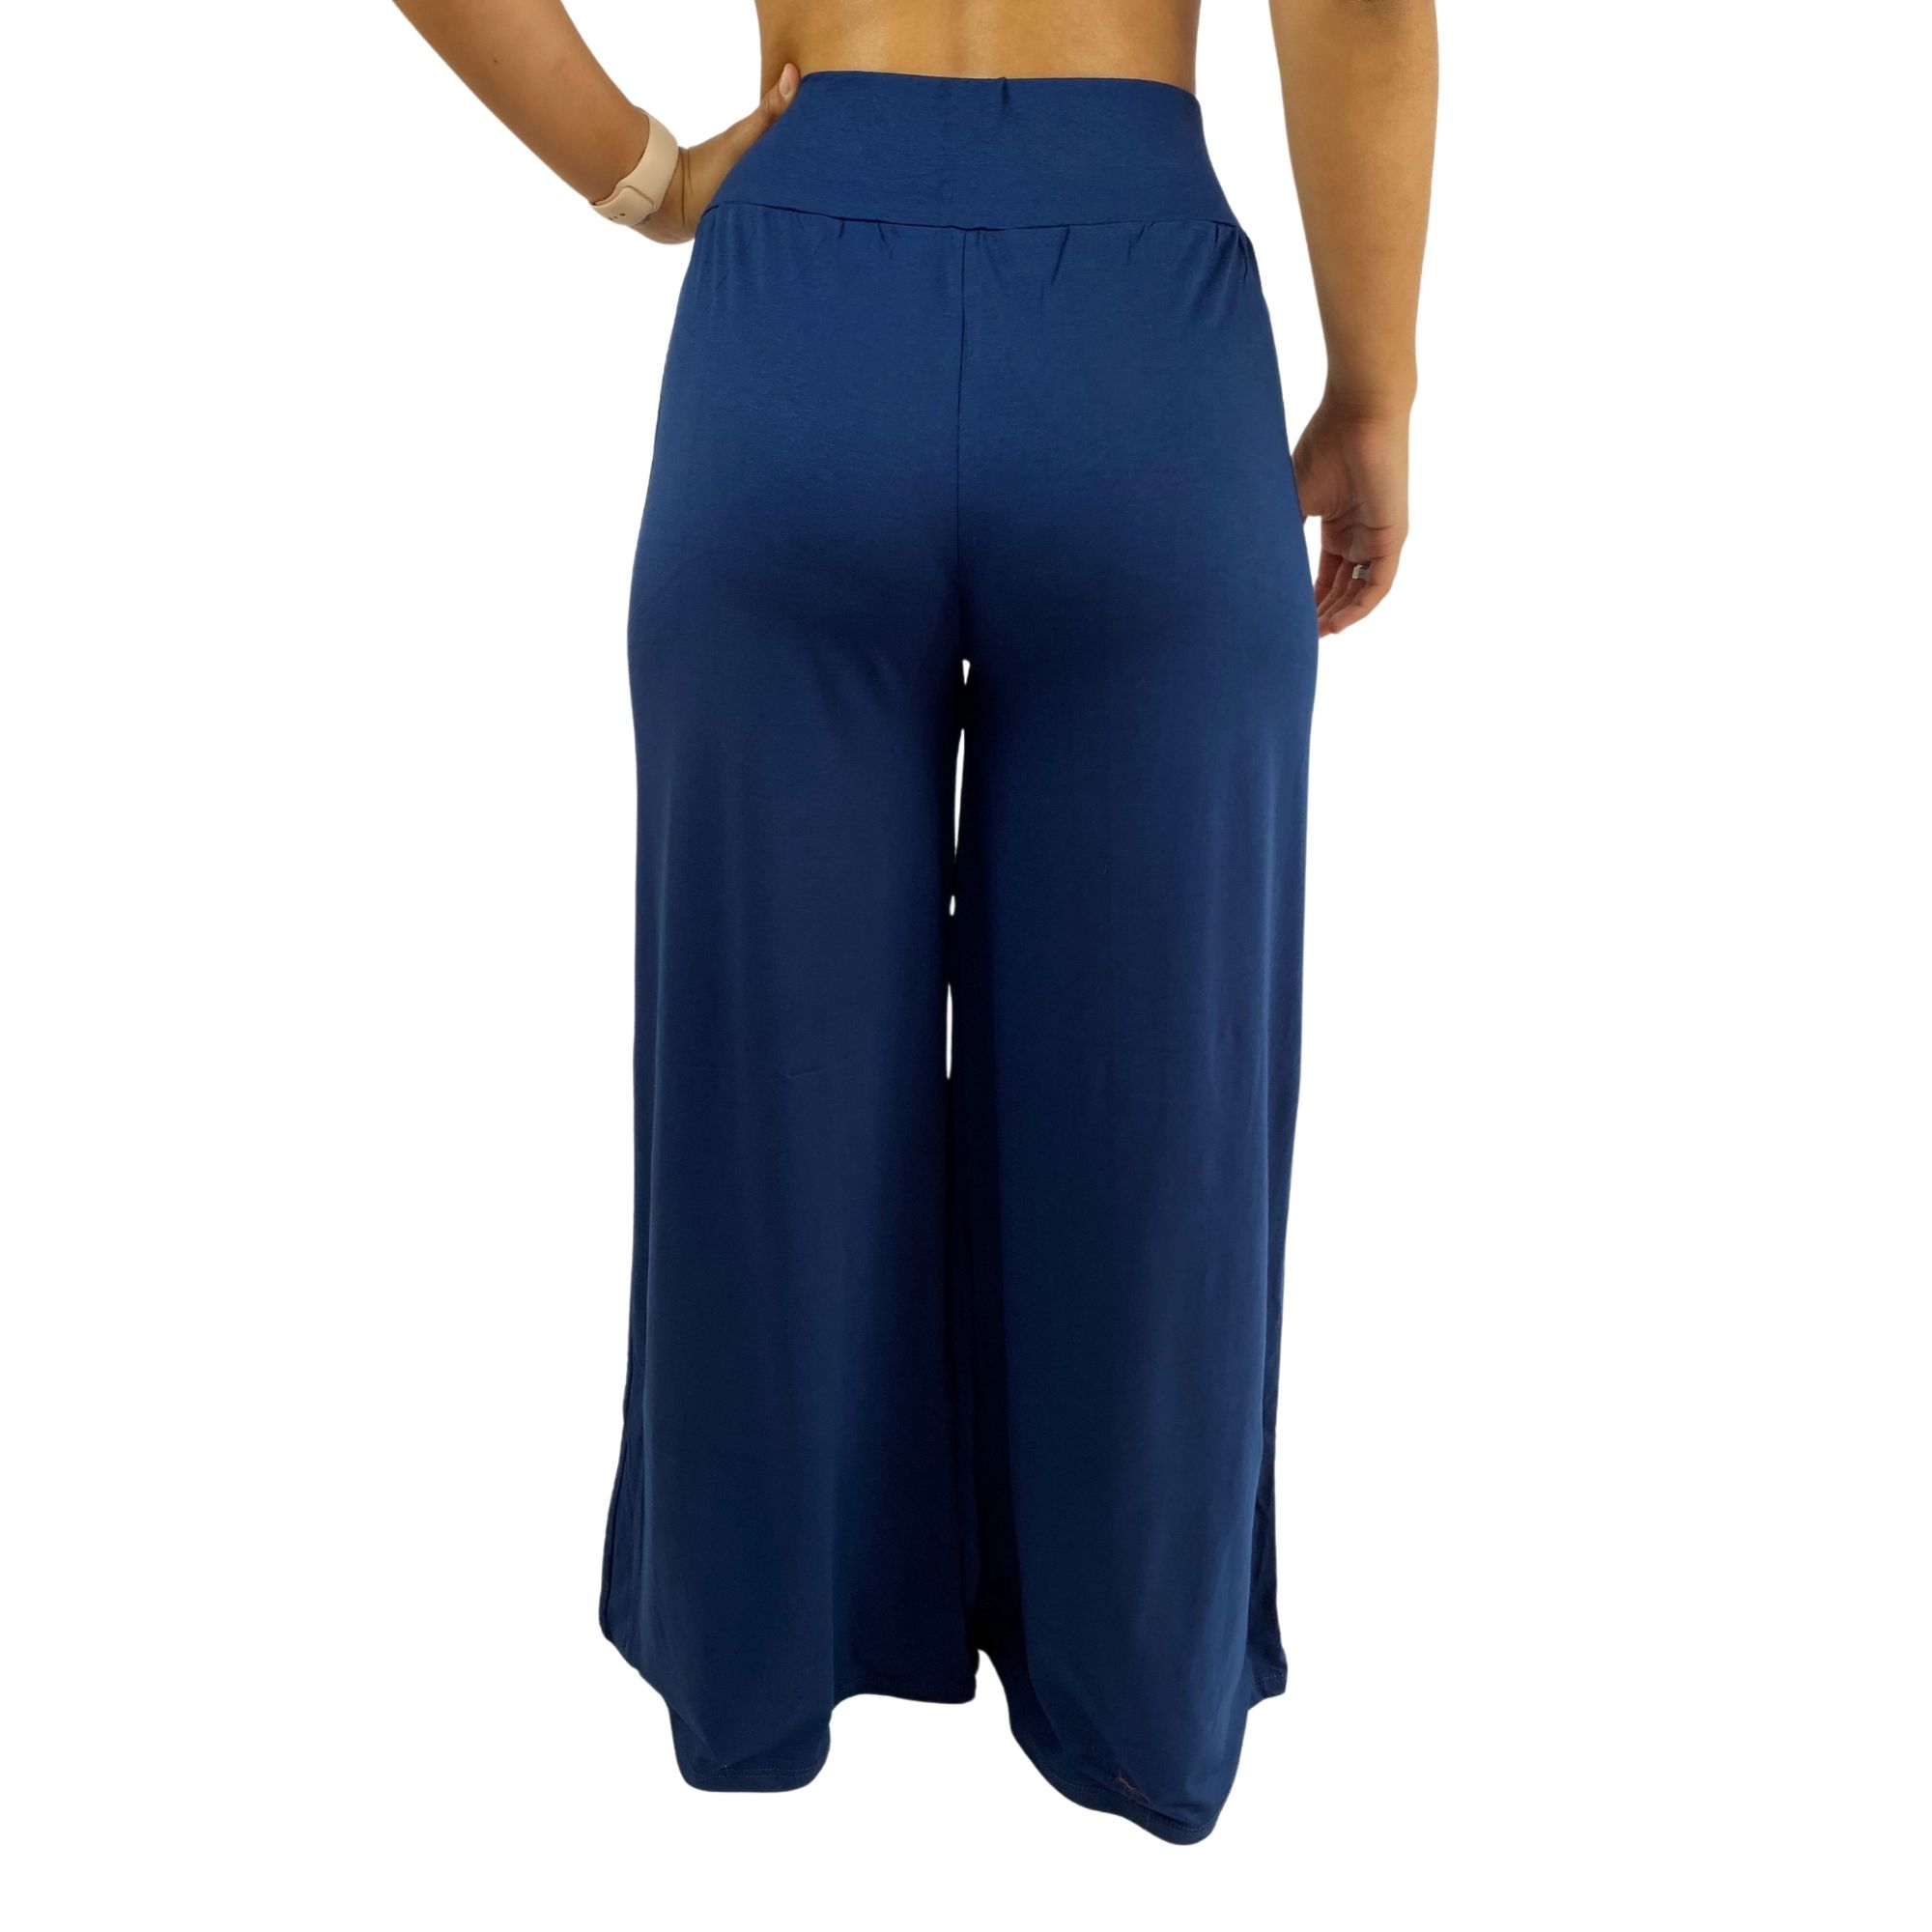 Calça Feminina Pantalona Viscose